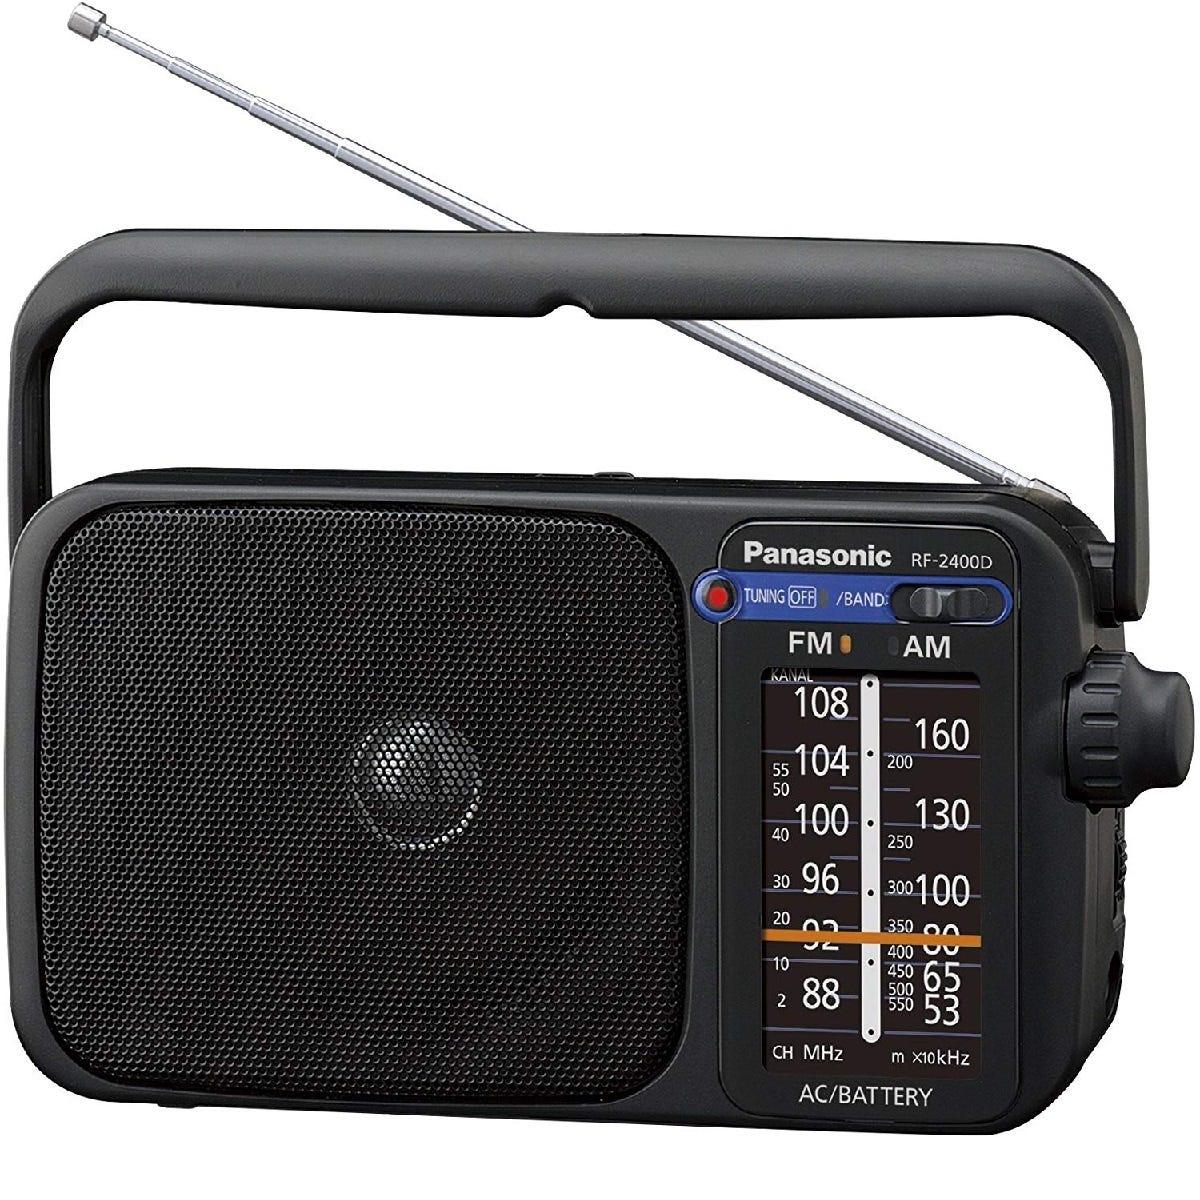 Panasonic RF-2400D Digital (Not Dab) AM/FM Portable Radio - Black